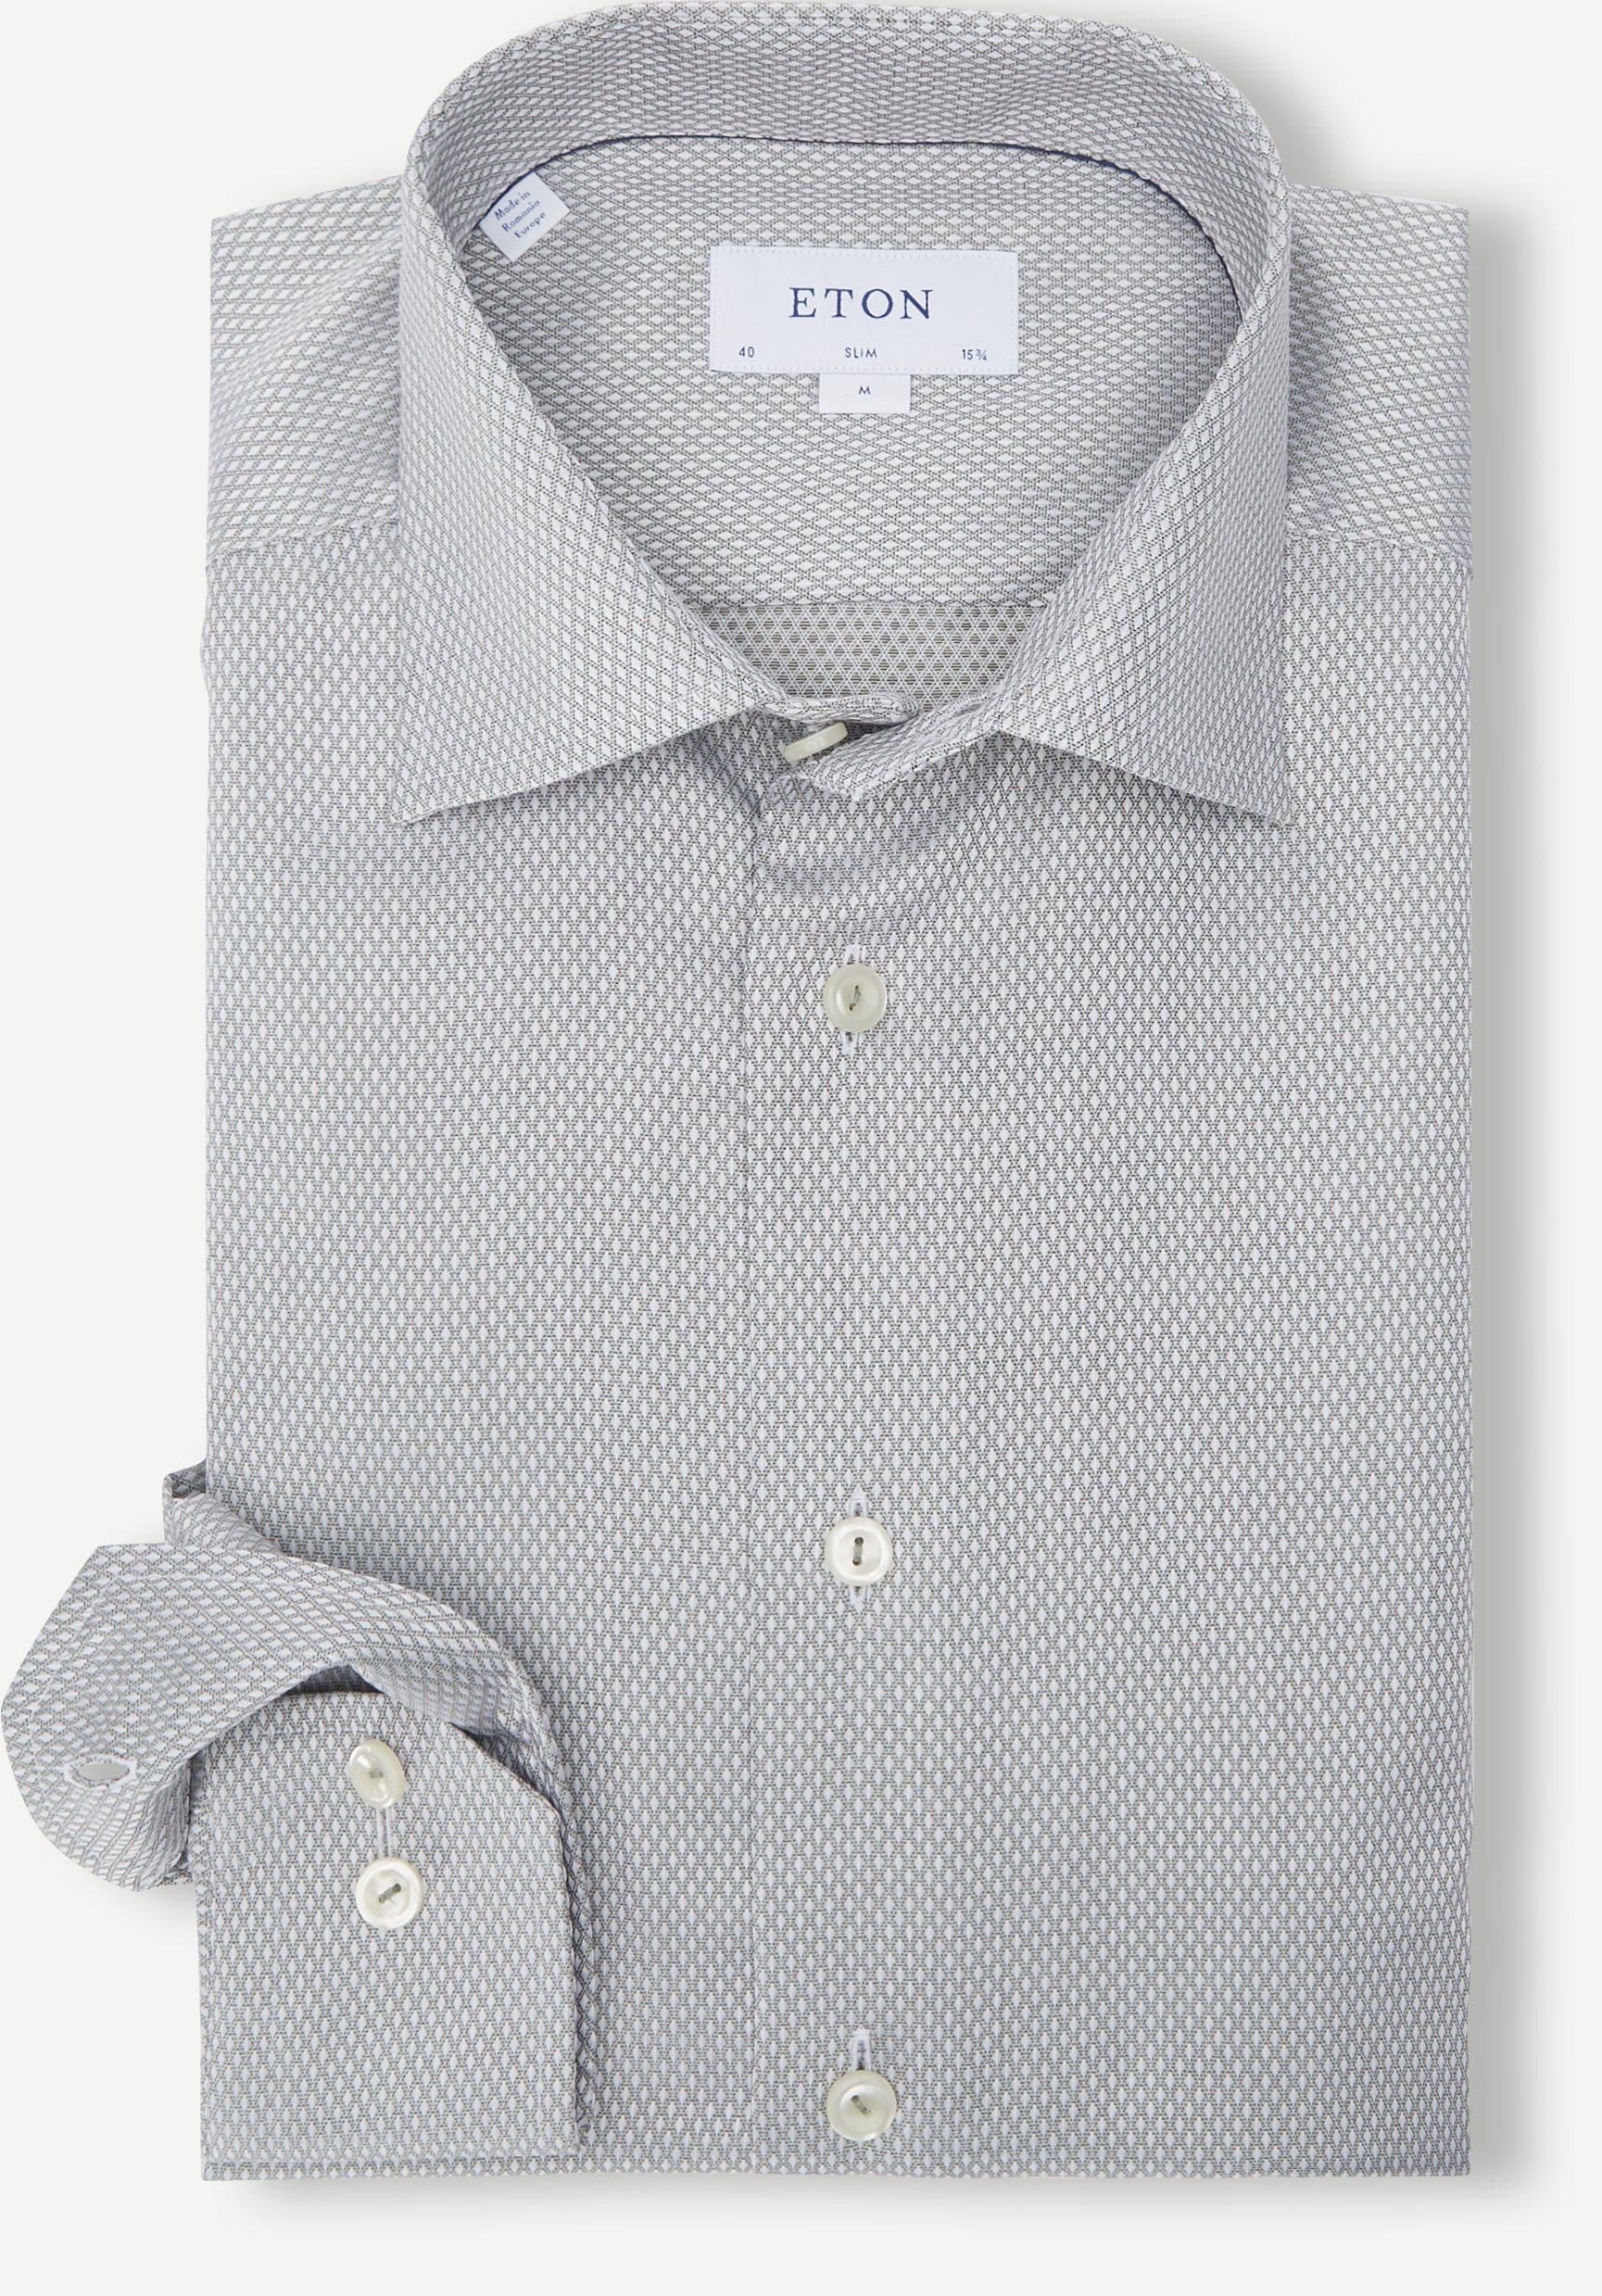 Dobby Shirt - Shirts - Green